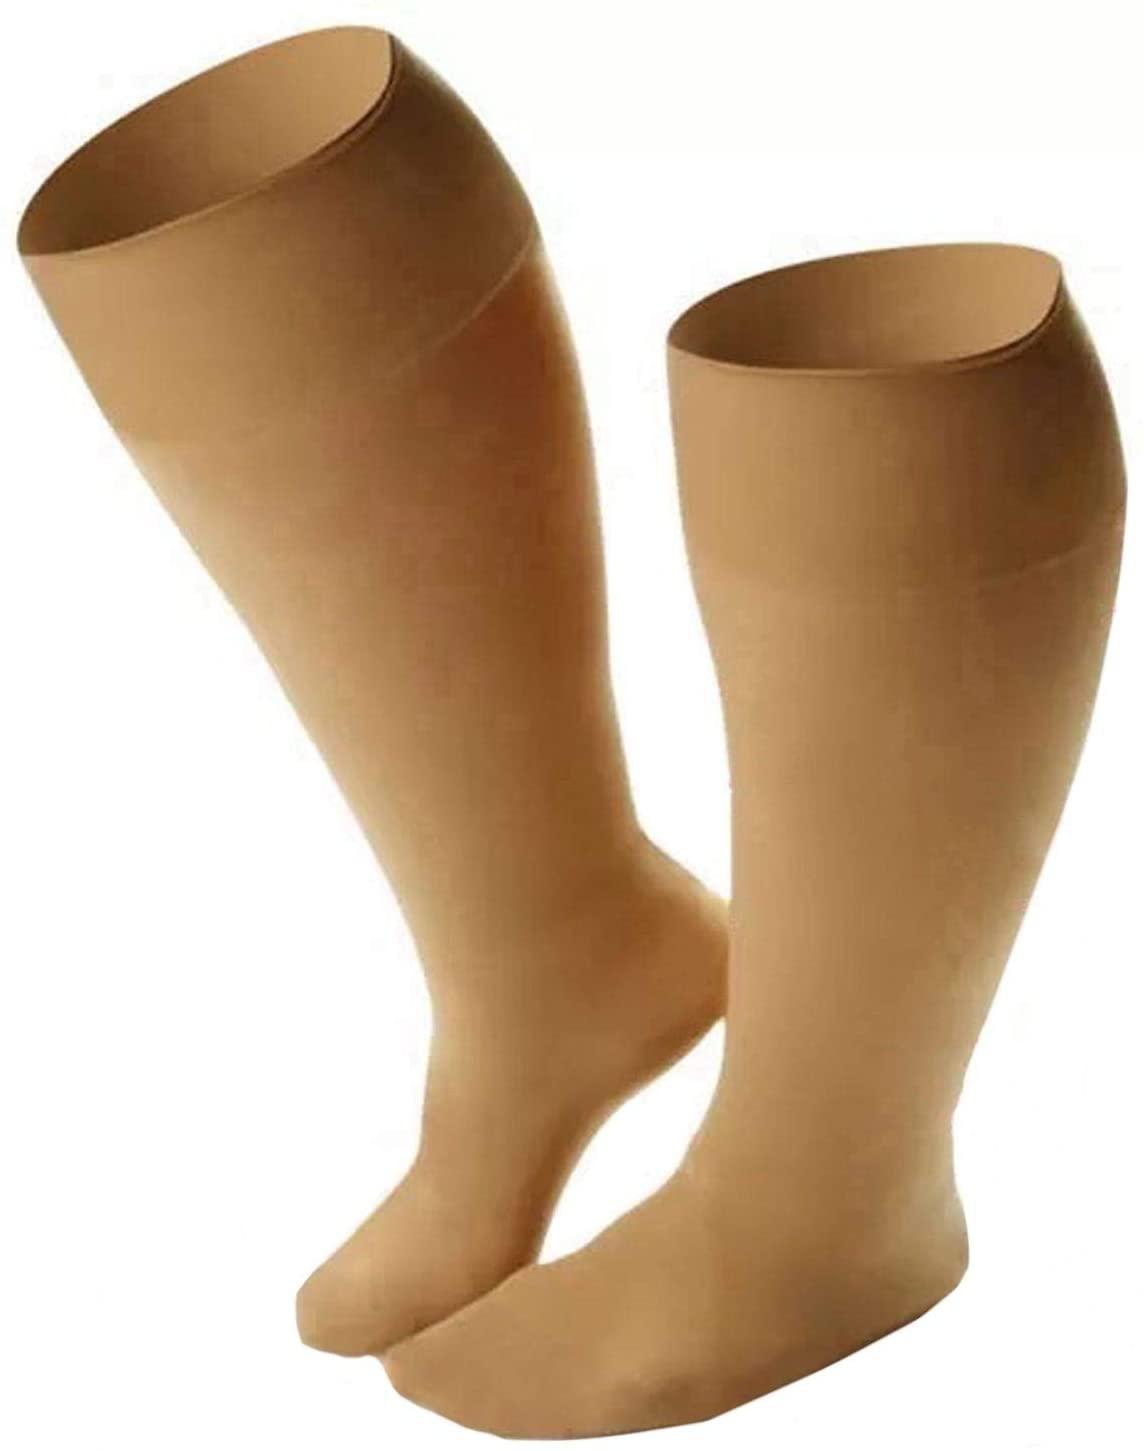 Runee Ultra Wide Knee High Close Toe Calf Compression -Tailored To Wide Calves (Beige)